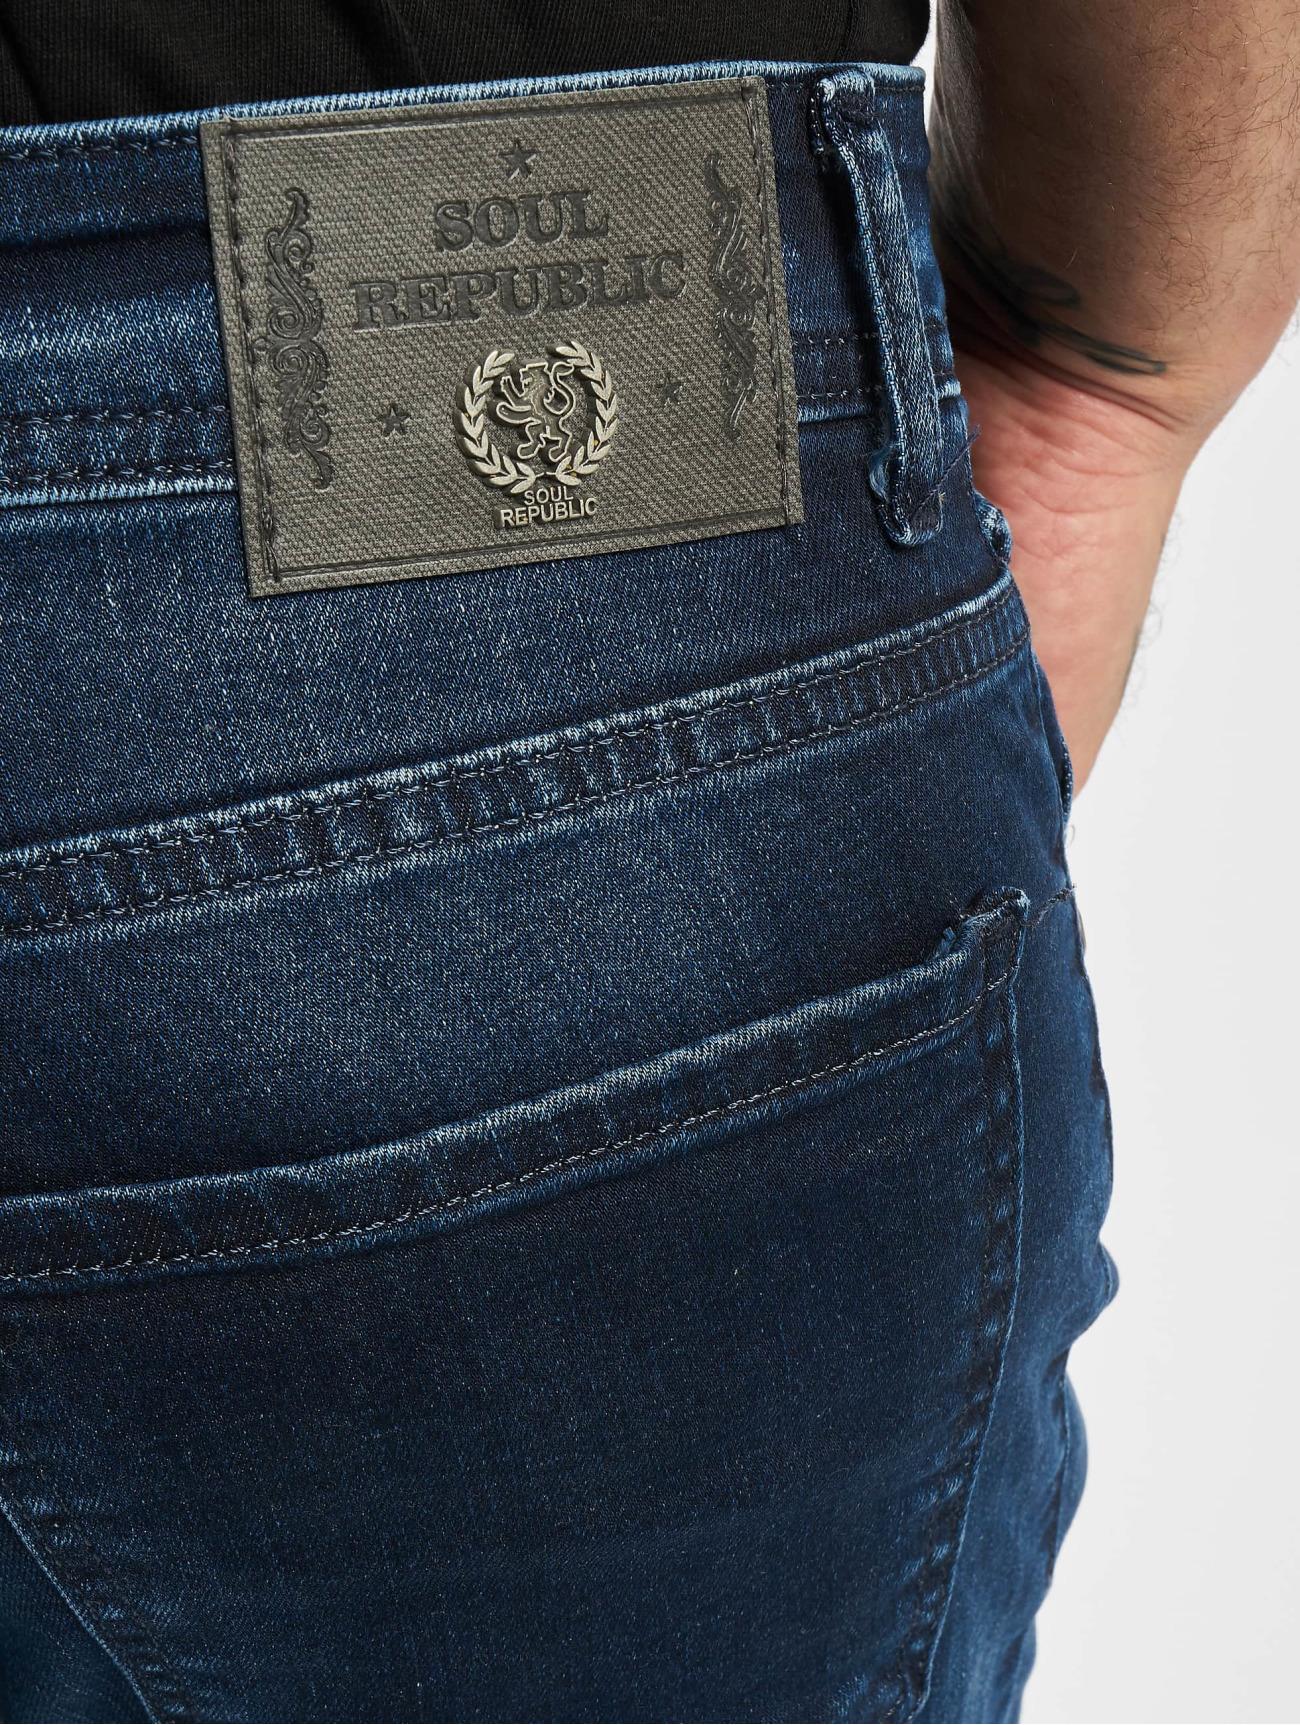 Aarhon  Mick   bleu Homme Jean skinny  773702 Homme Jeans